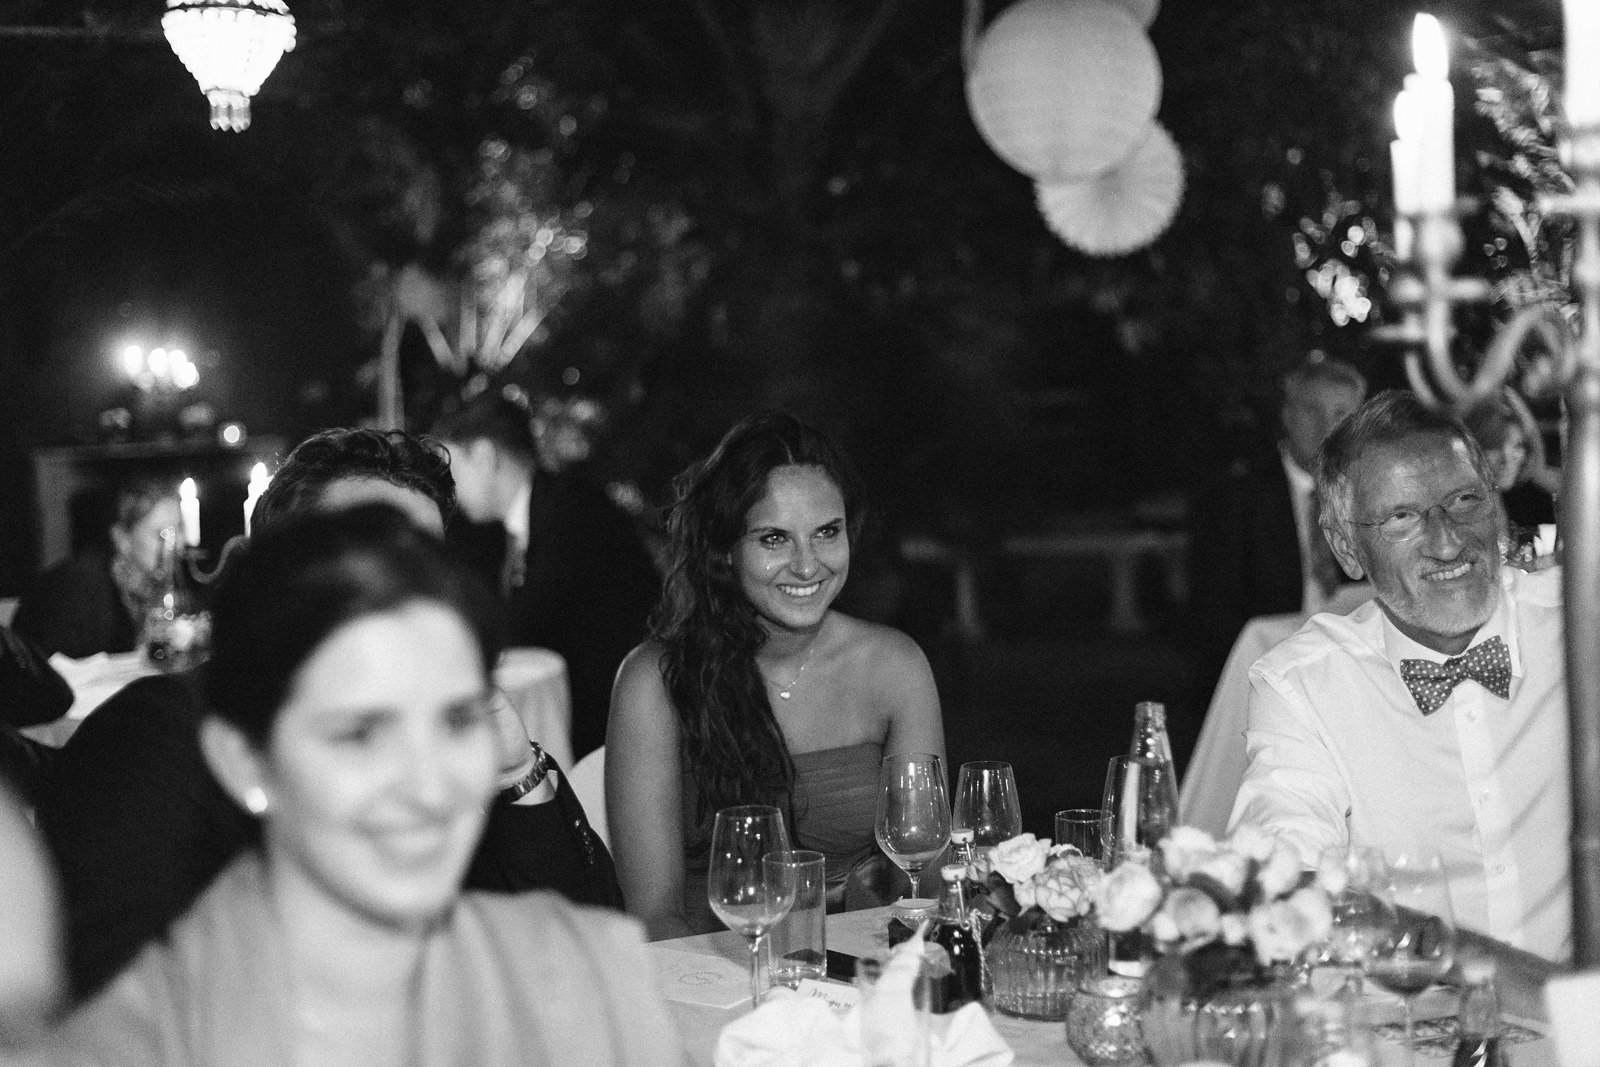 vsco kodak tmax 400 wedding